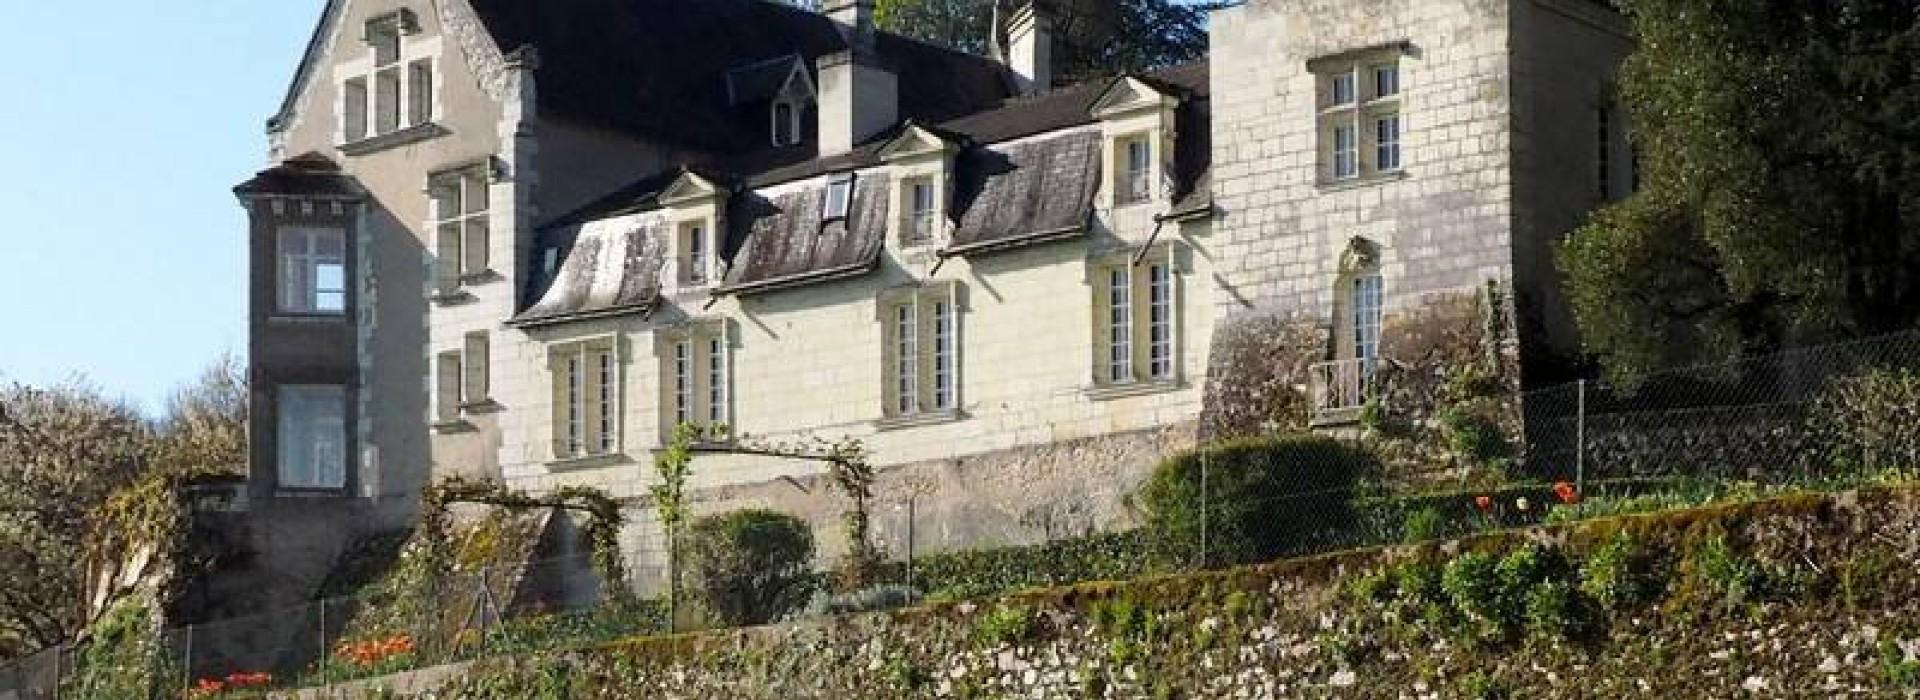 Les Caves Du Manoir manoir de beauregard: bed and breakfast france, atlantic